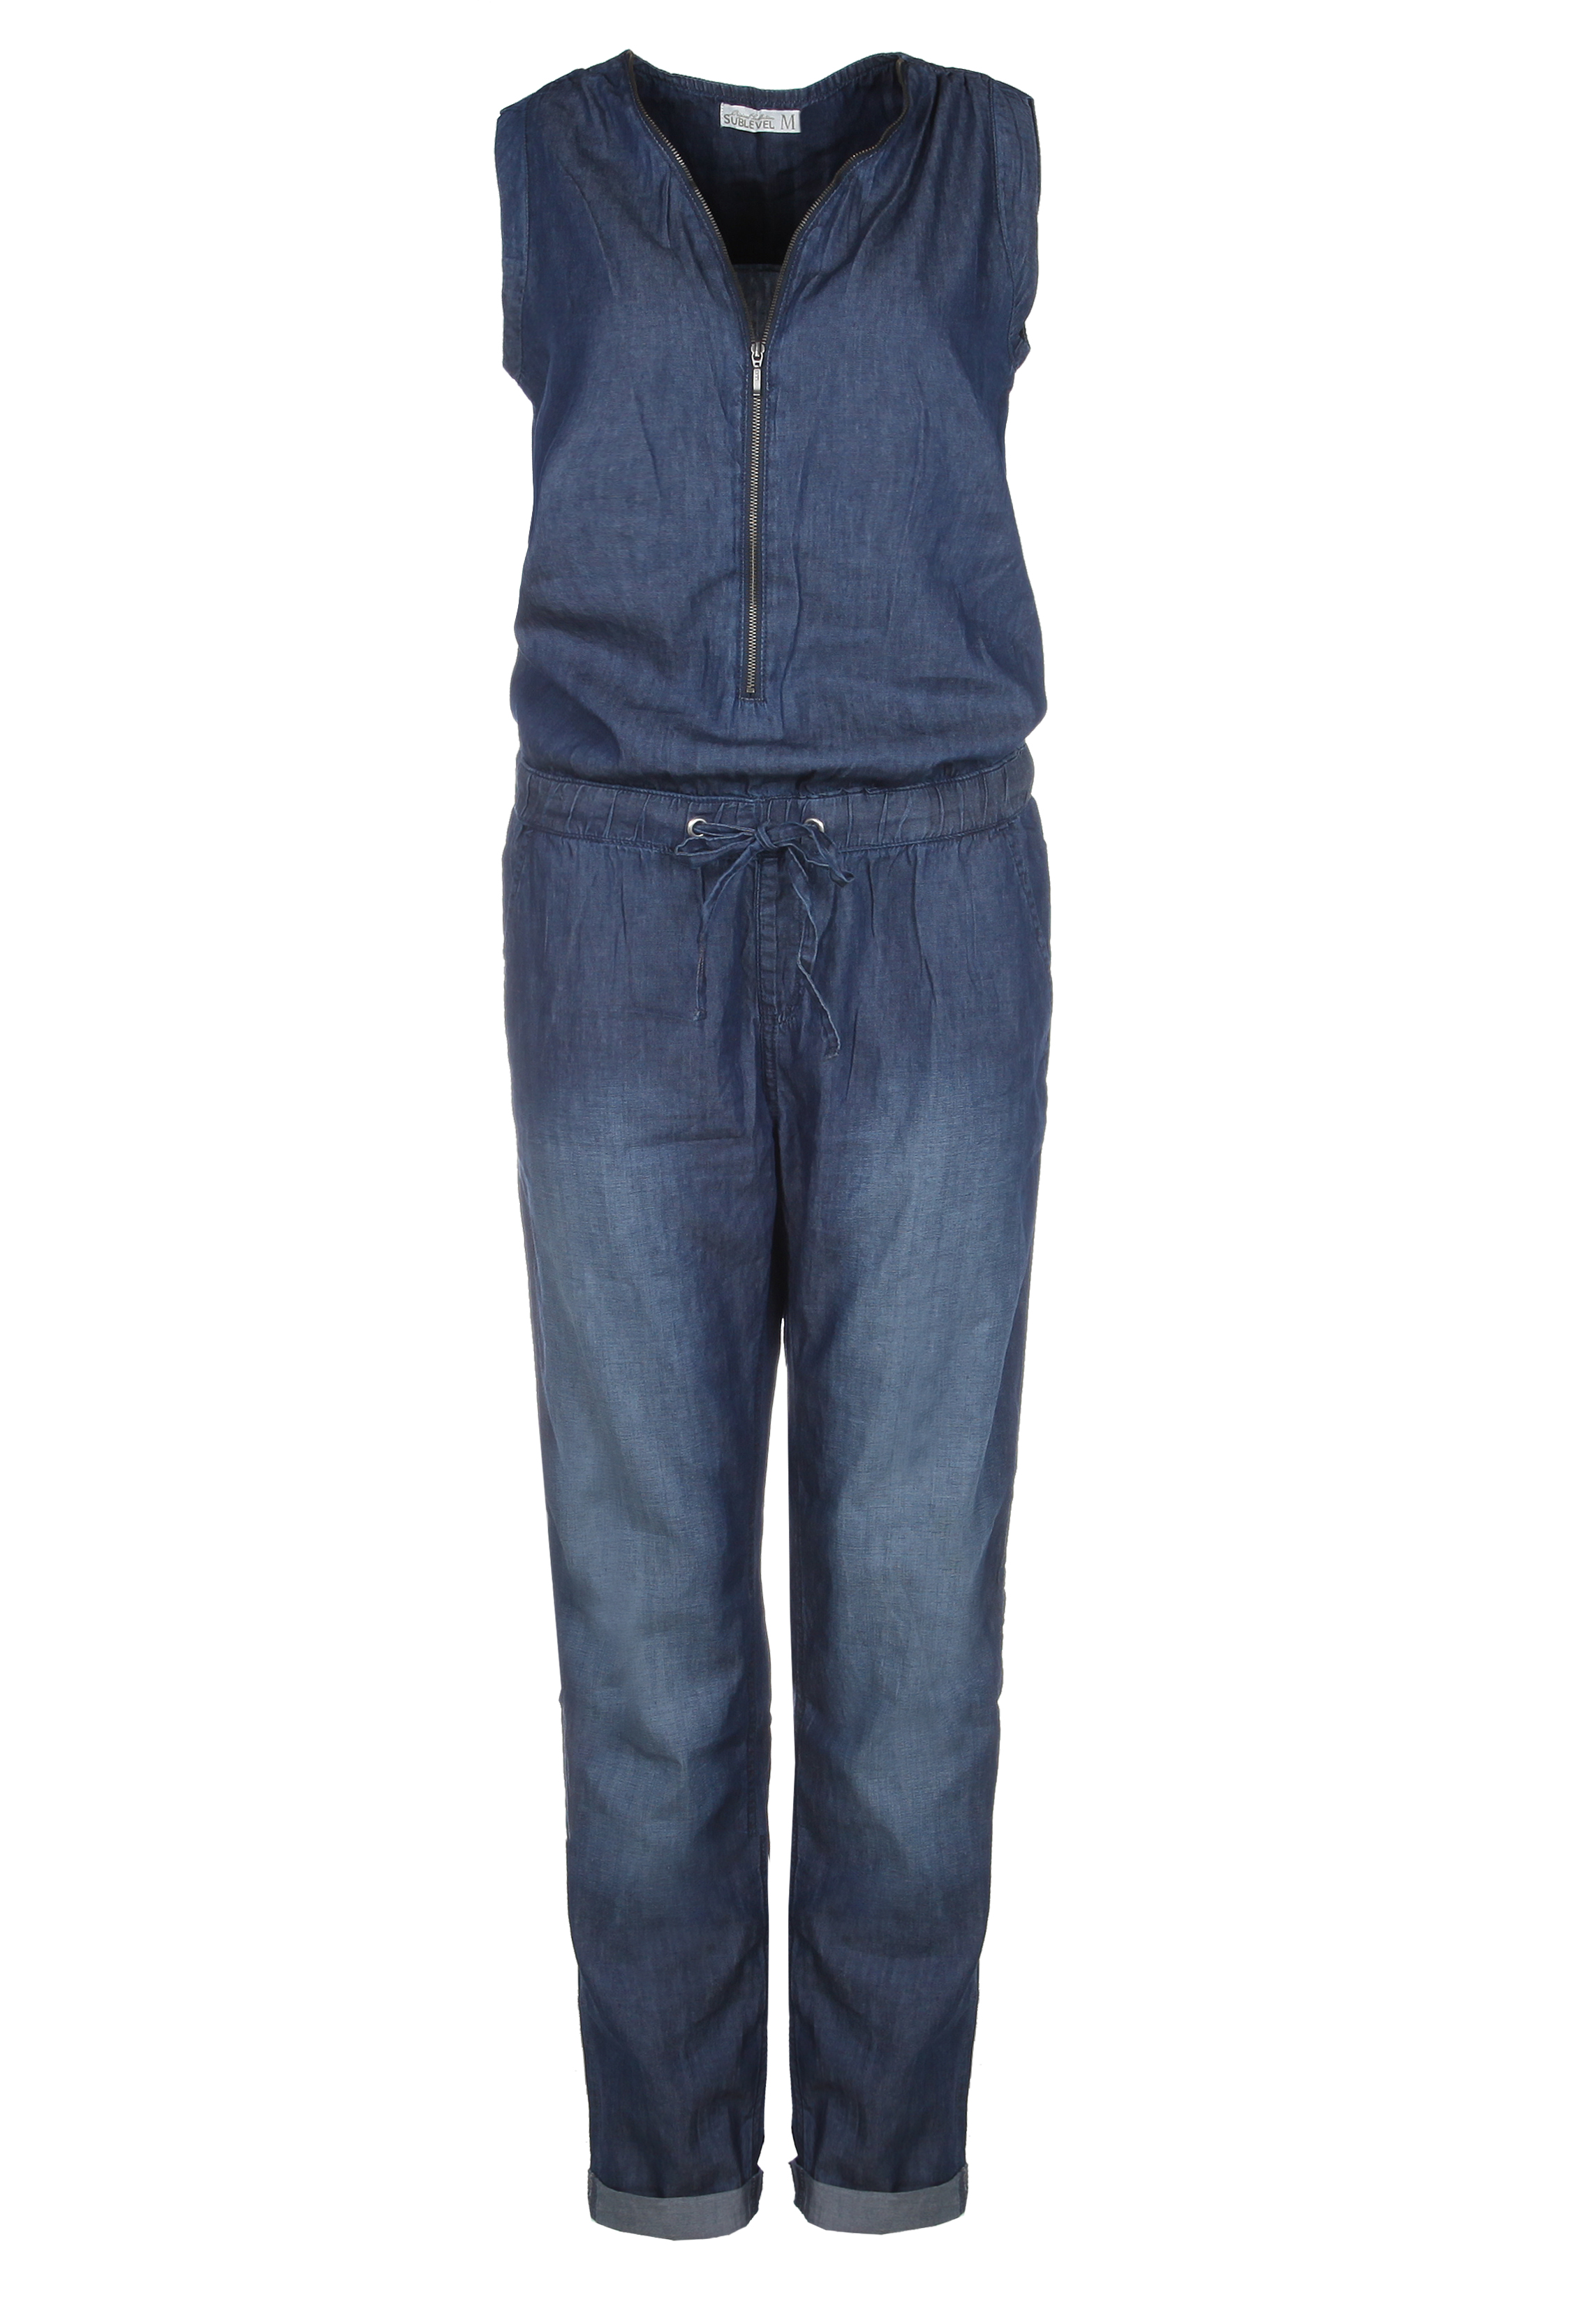 wholesale dealer c6588 4c987 Details zu Damen Jeans Jumpsuit Overall Hosenanzug Lang Denim Einteiler  Elegant Sublevel